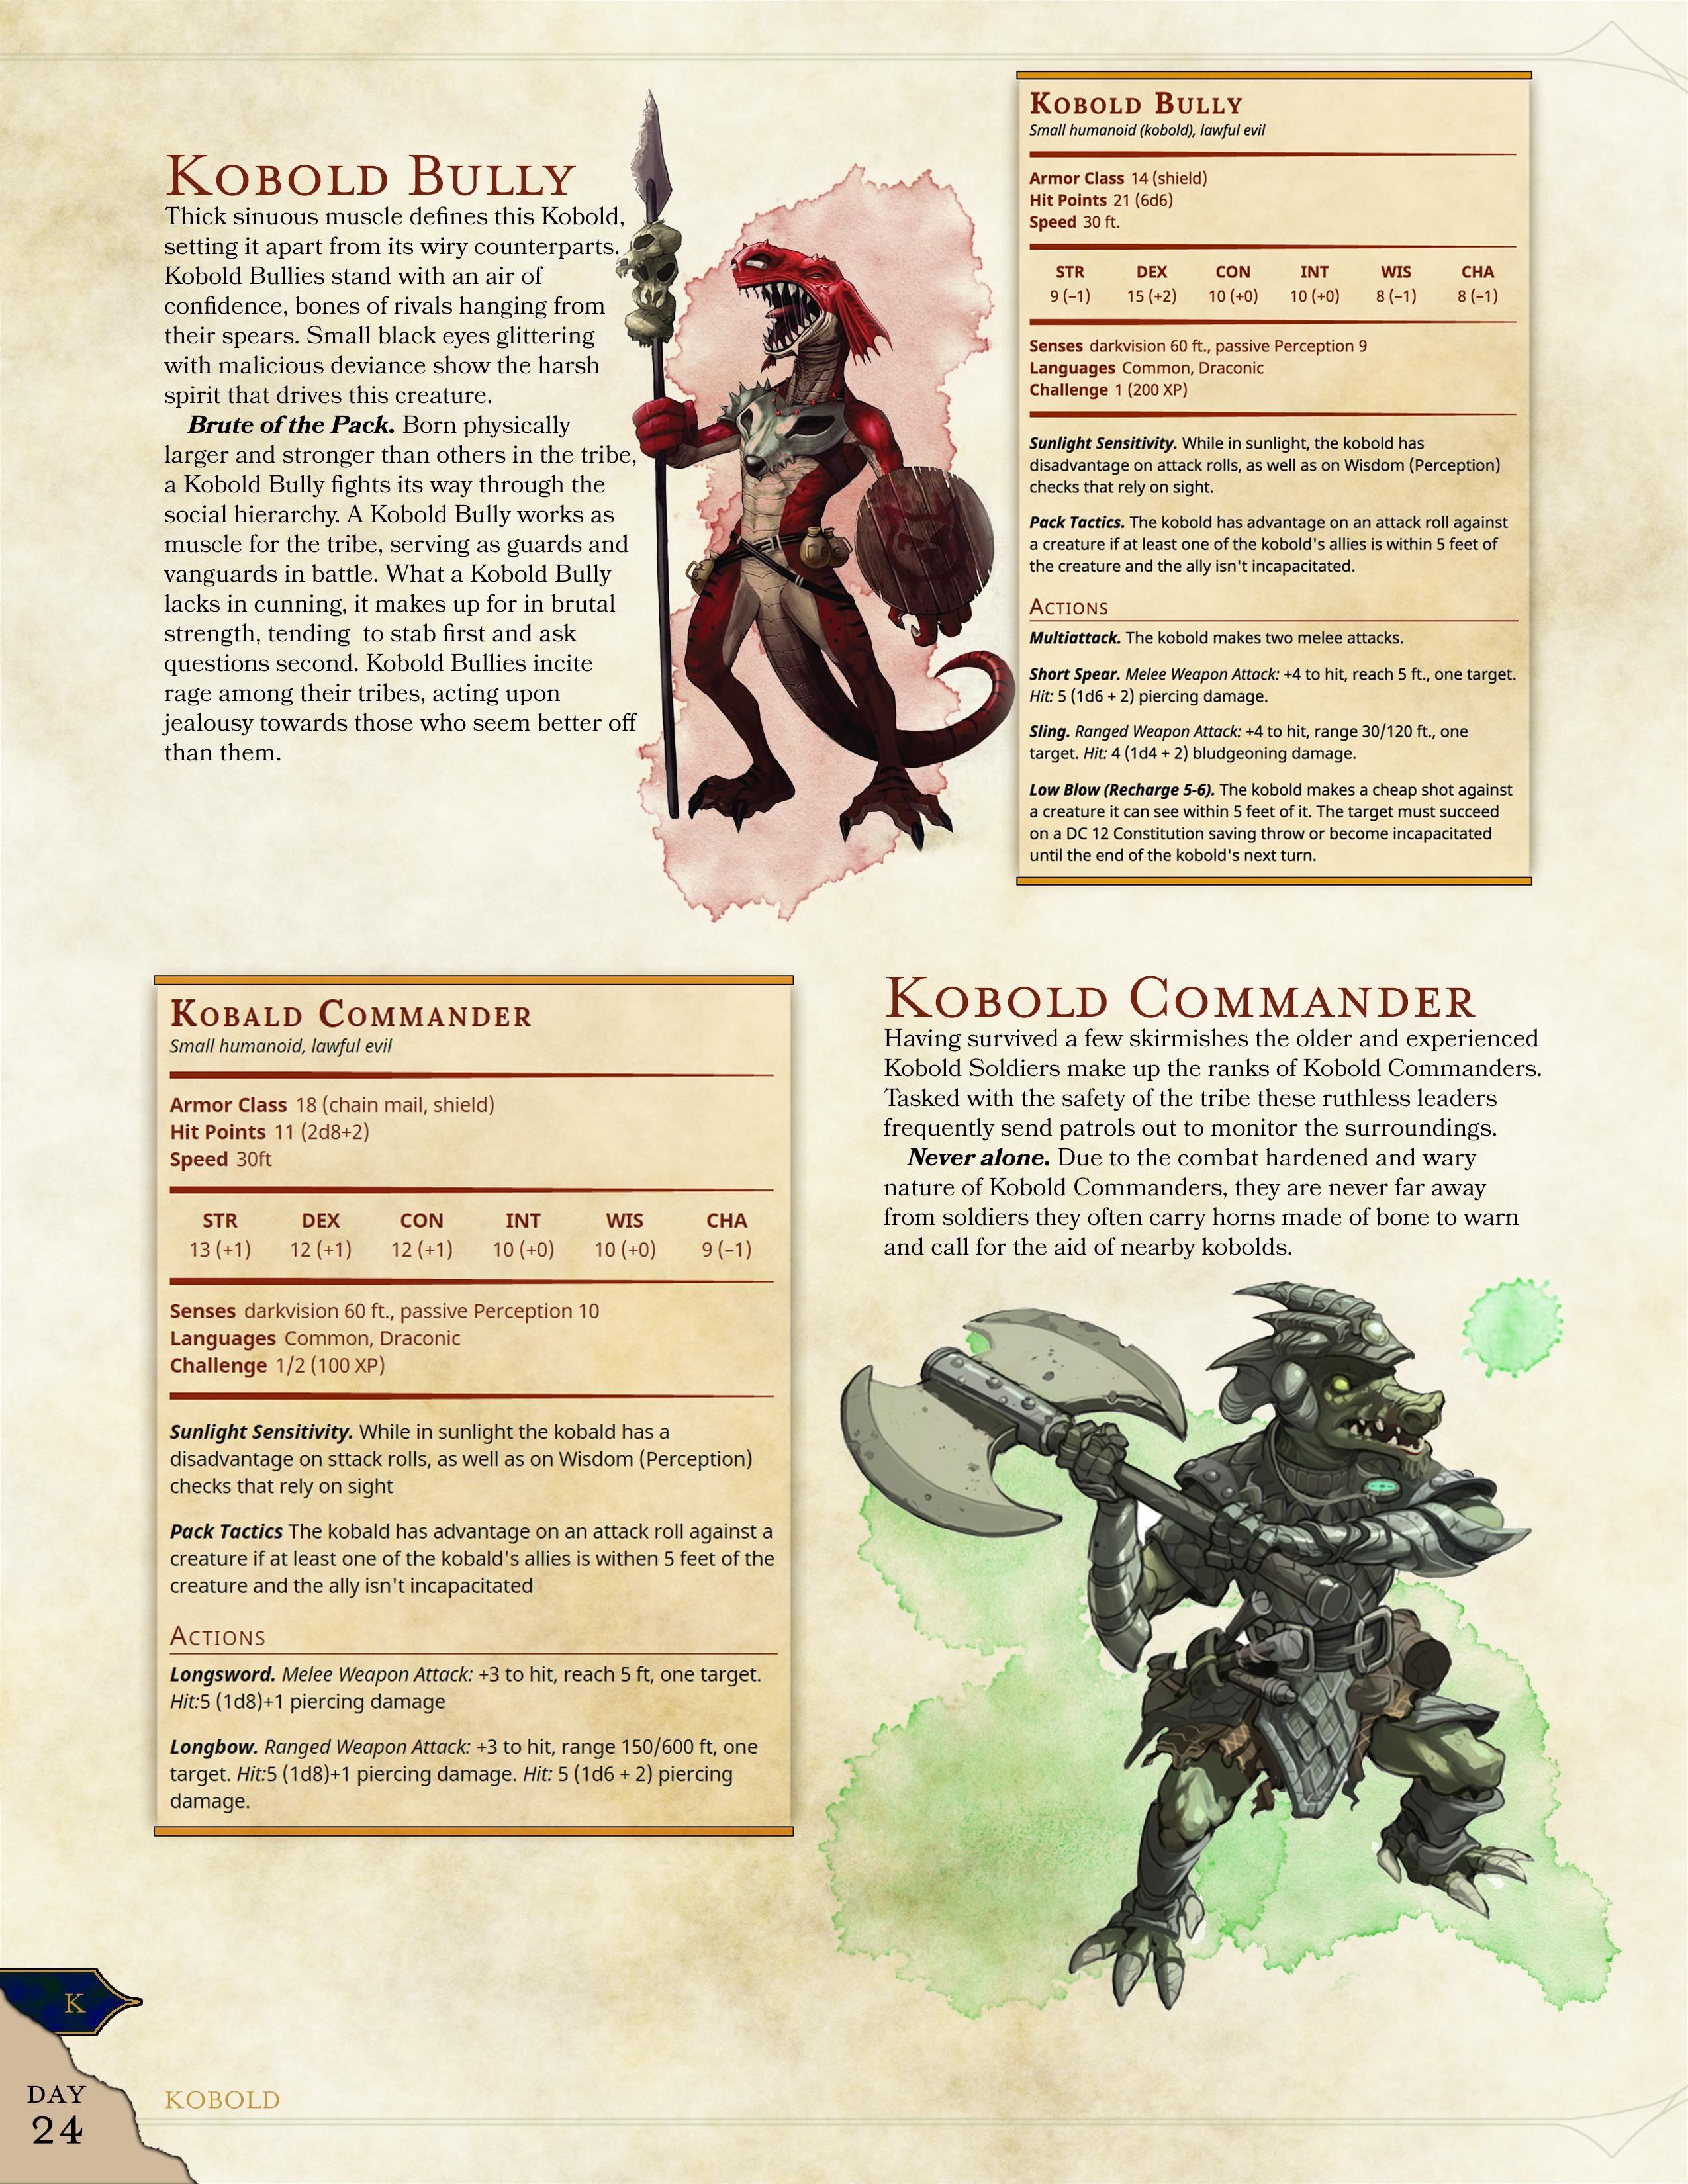 Updated Day 25 Kobold Bully with Bonus Monster by /u